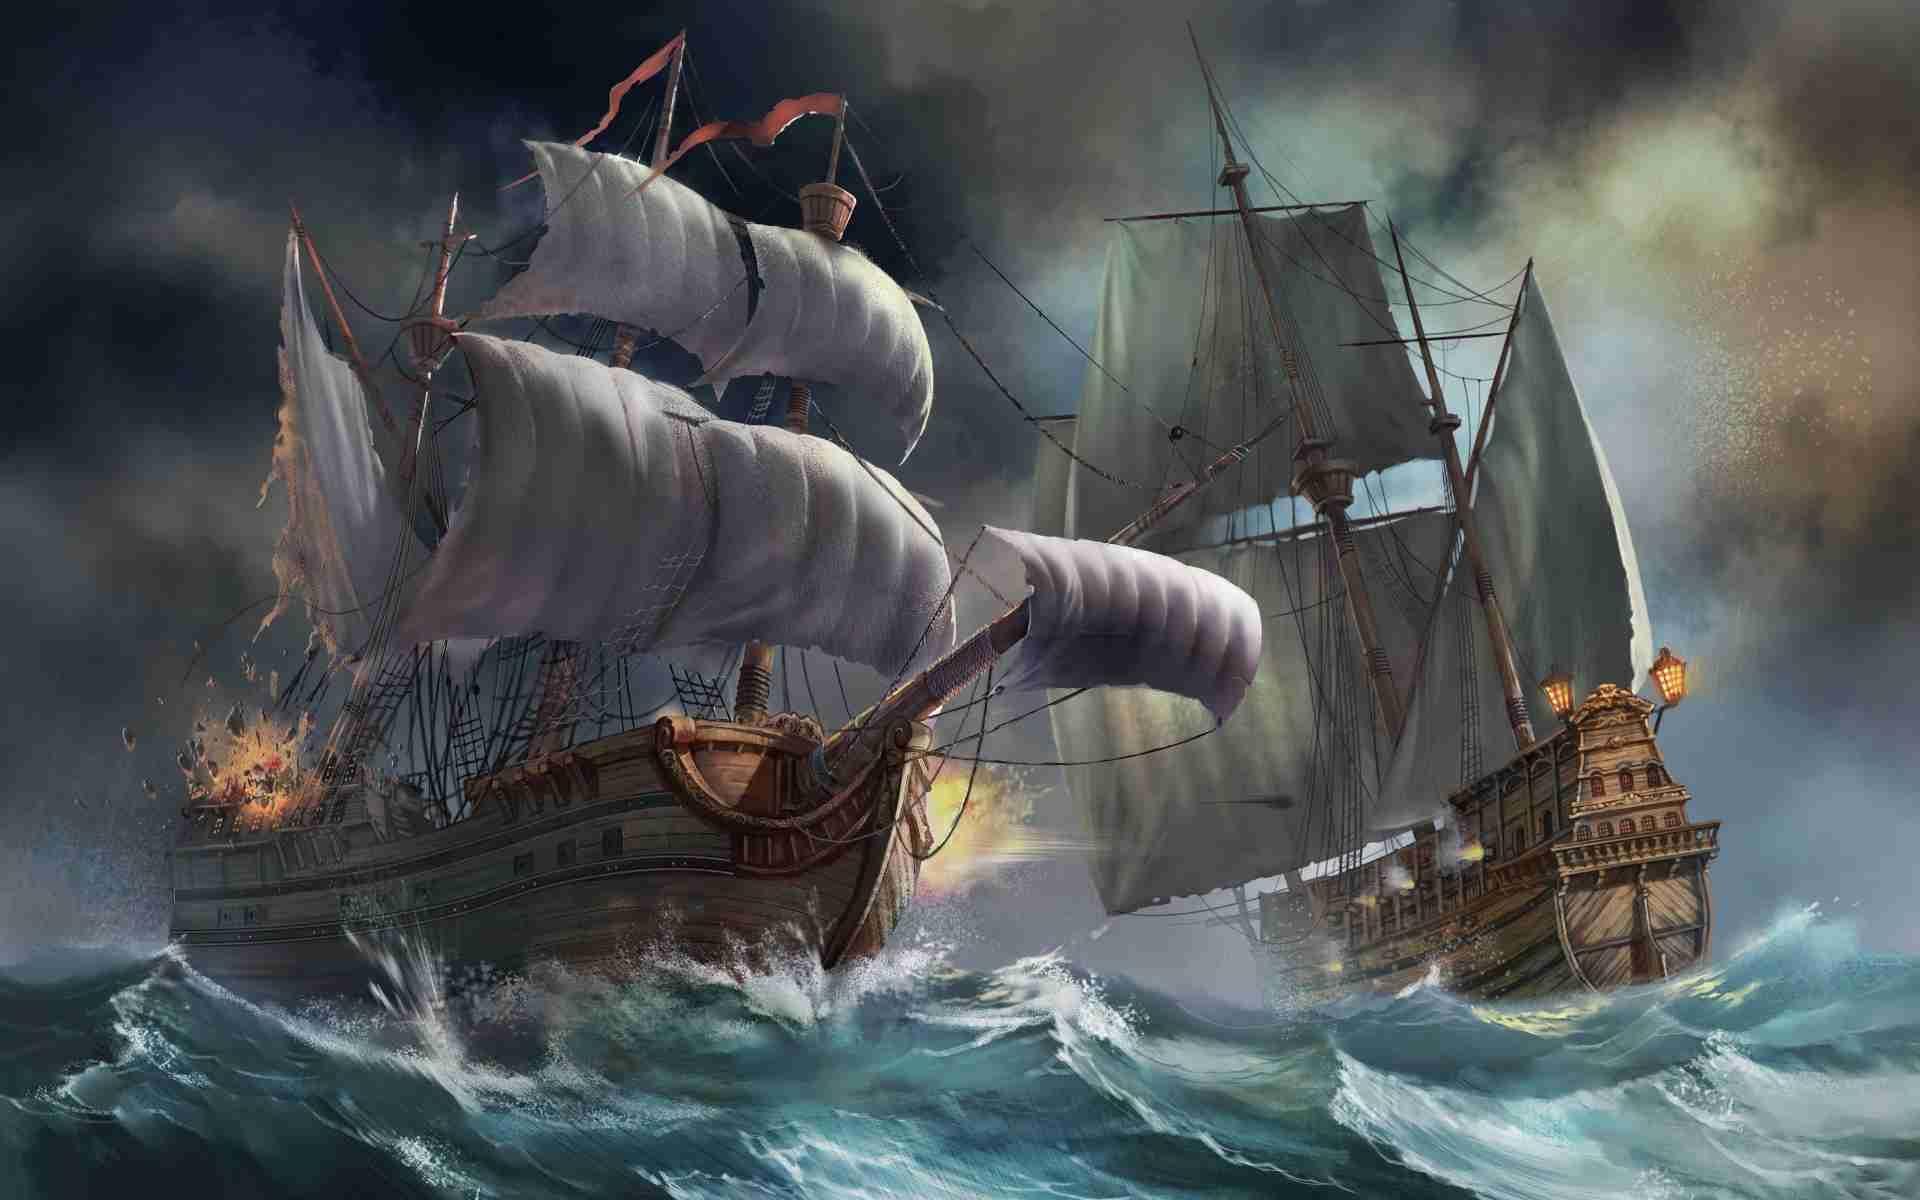 storm ship - Google 검색